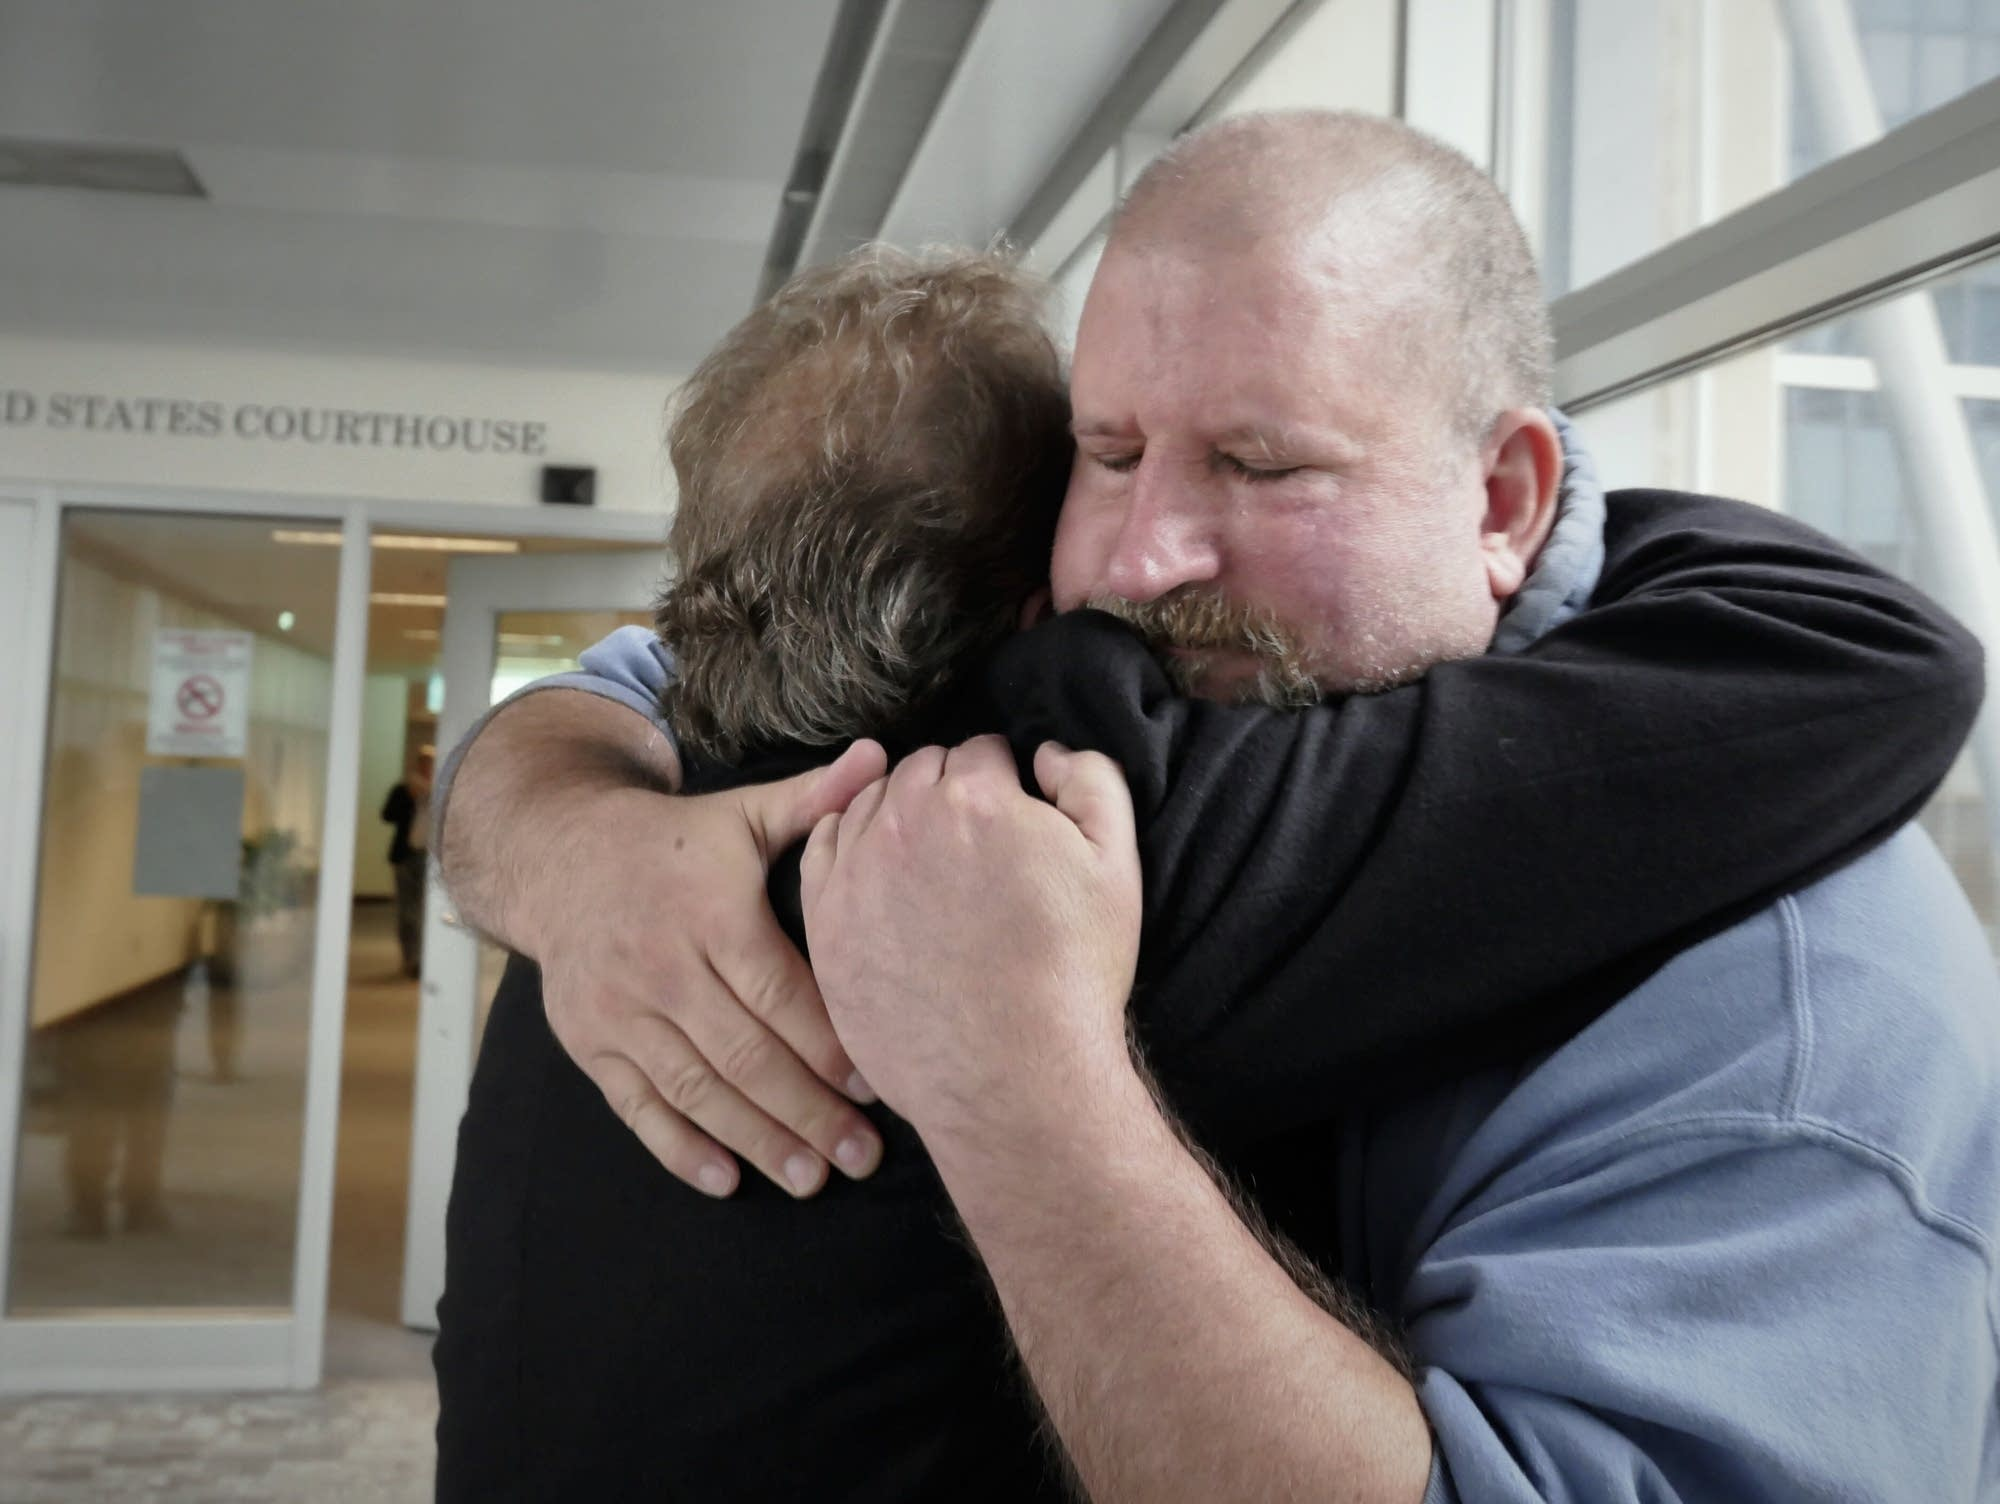 Clergy abuse victim David Lind, right, hugs fellow survivor